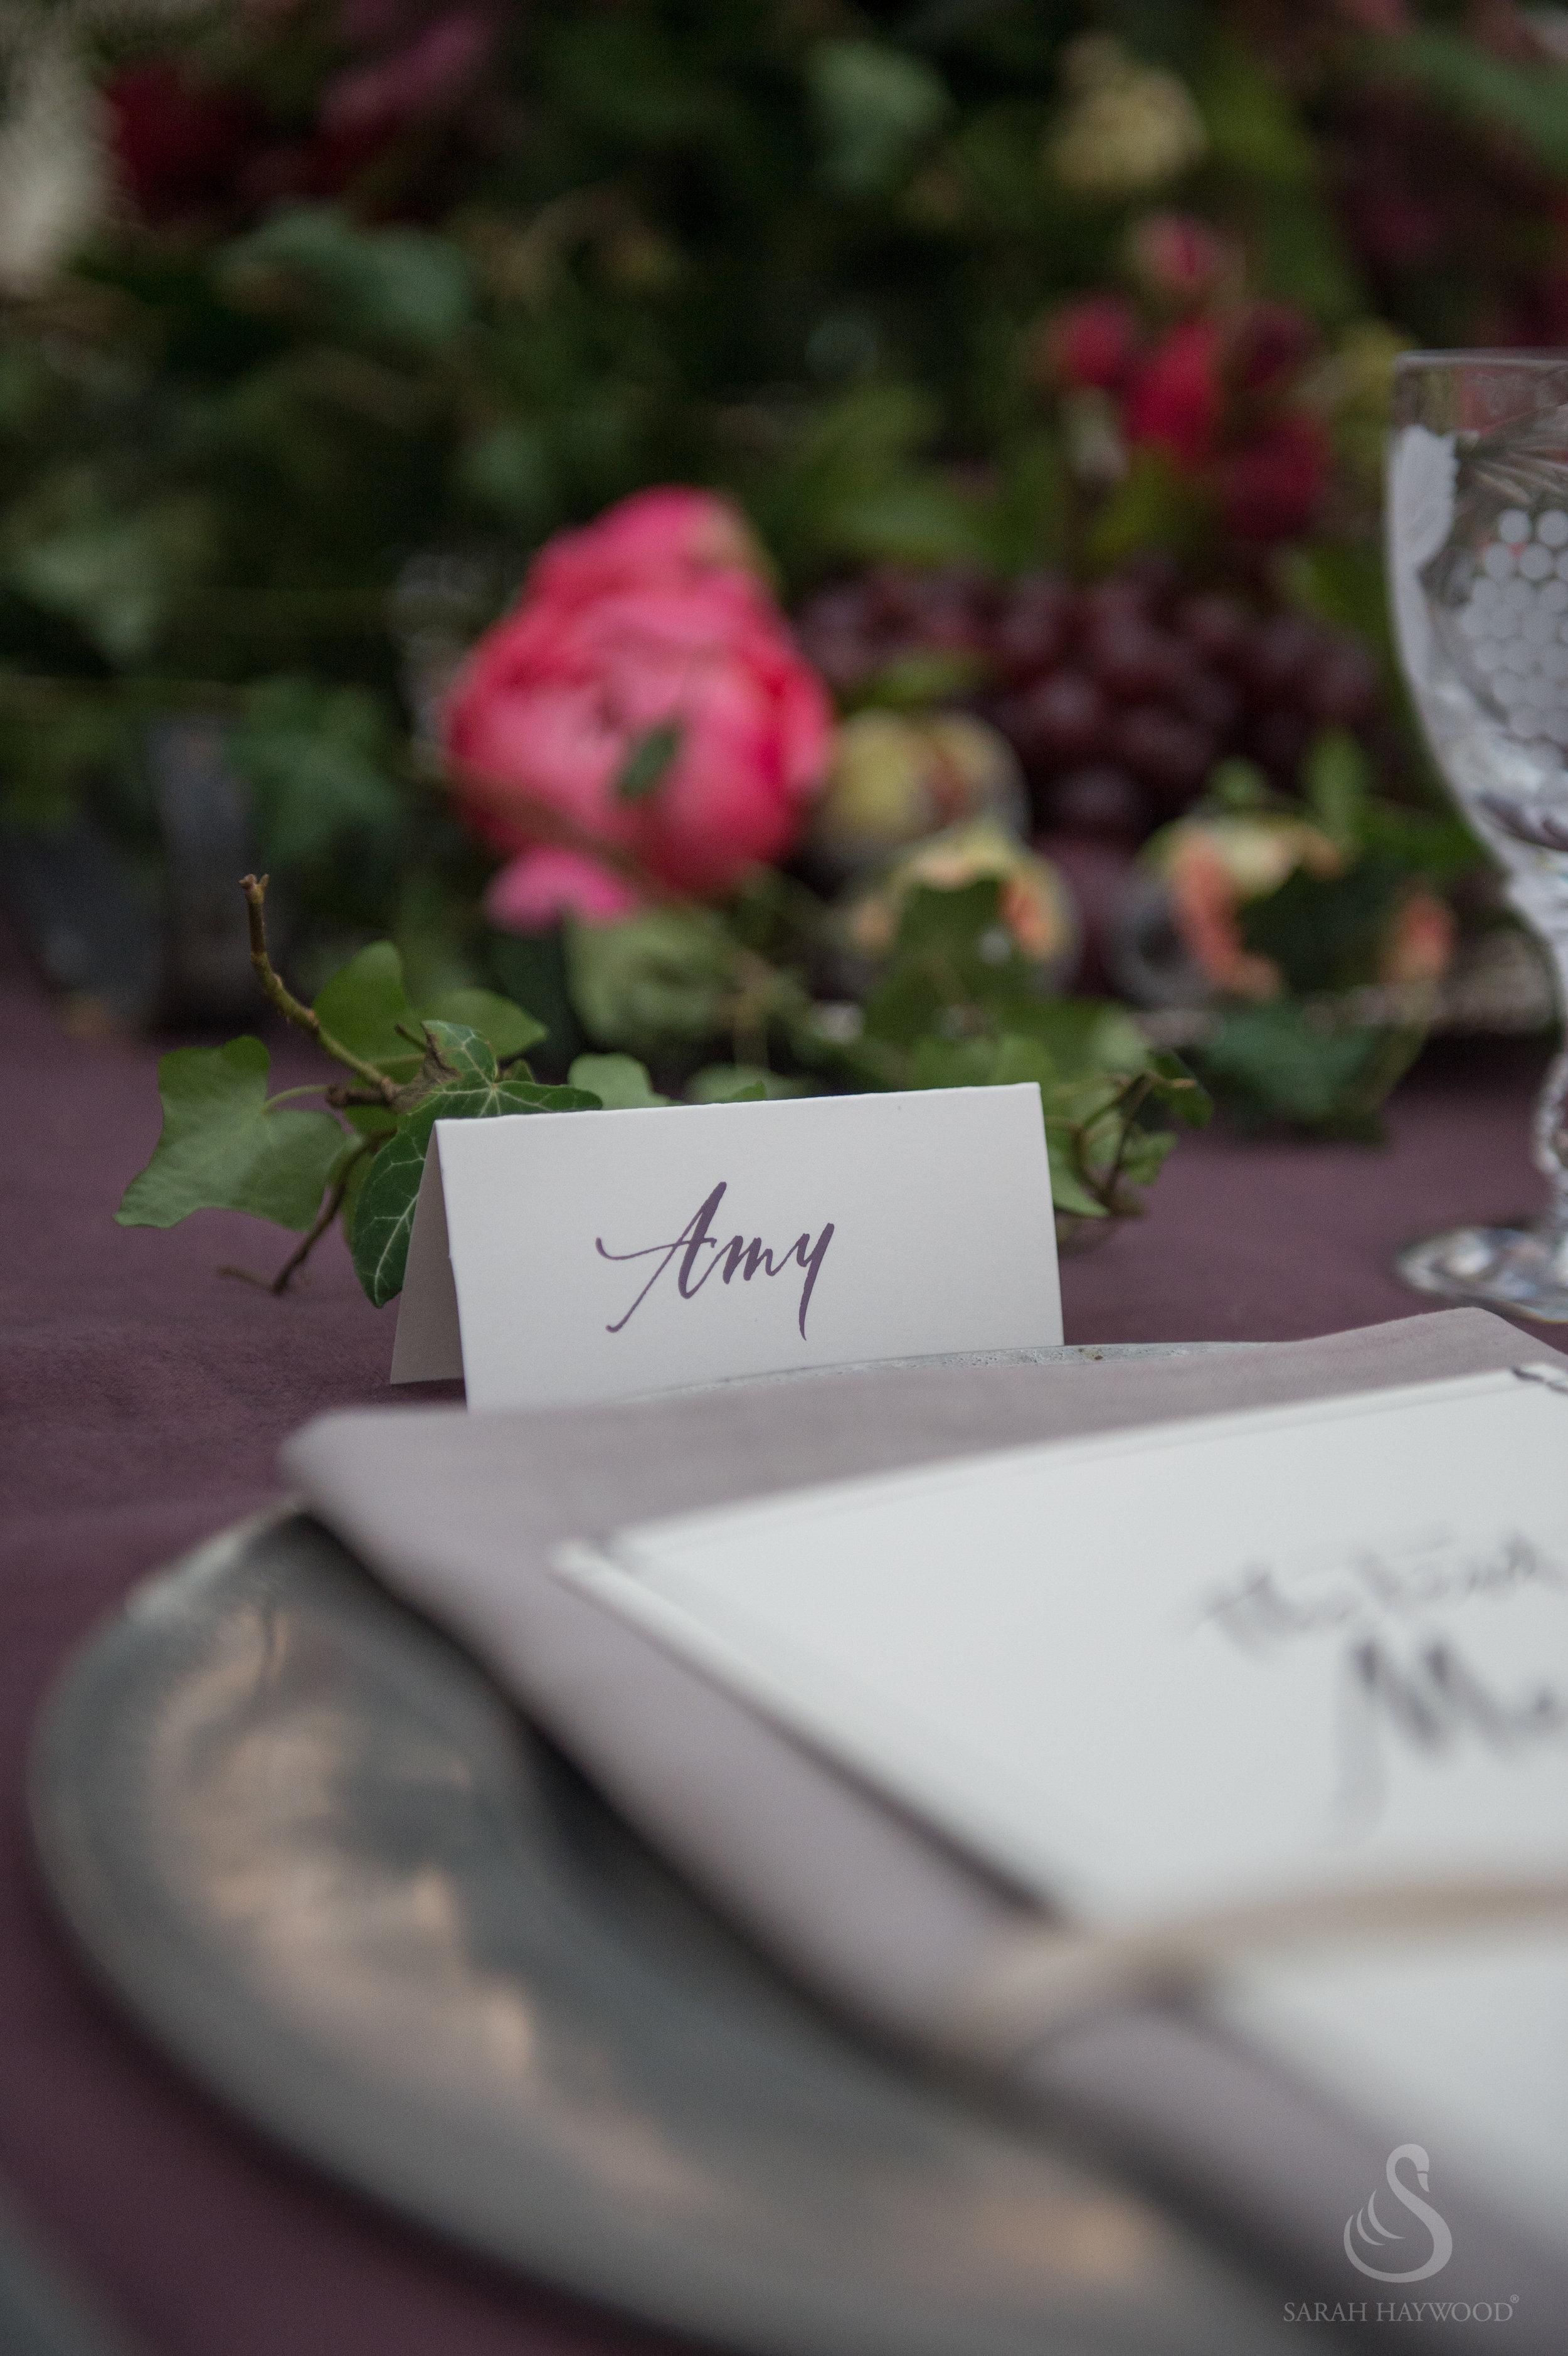 Scotland_Wedding_copyright_Carla Ten Eyck_for Sarah Haywood Wedding Design_809 copy.jpg